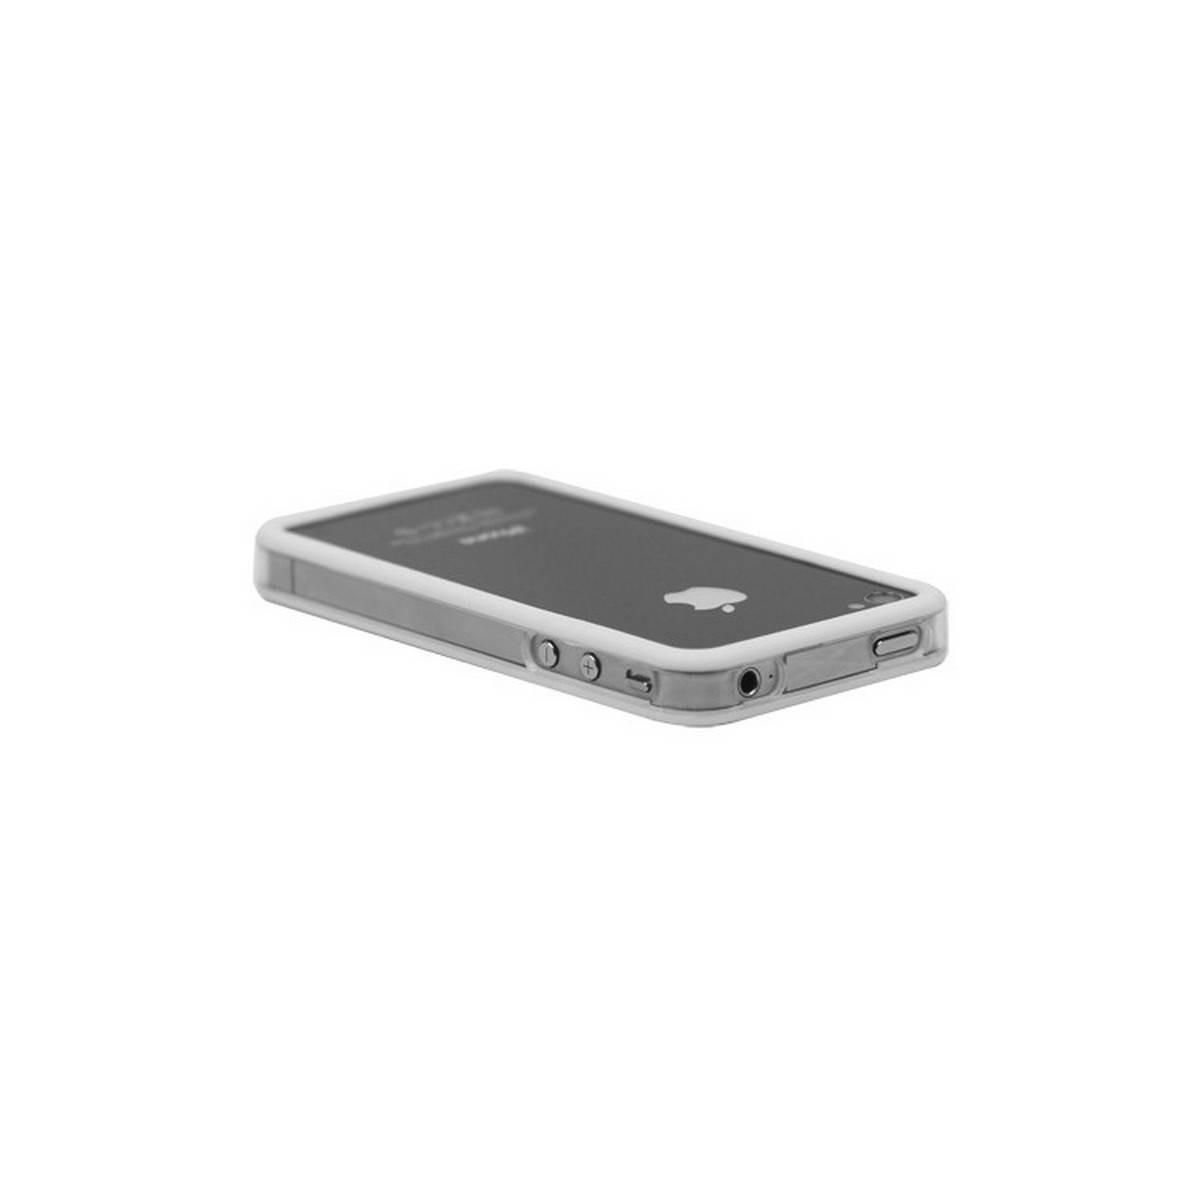 Bumper iphone 4/S blanco con transparente